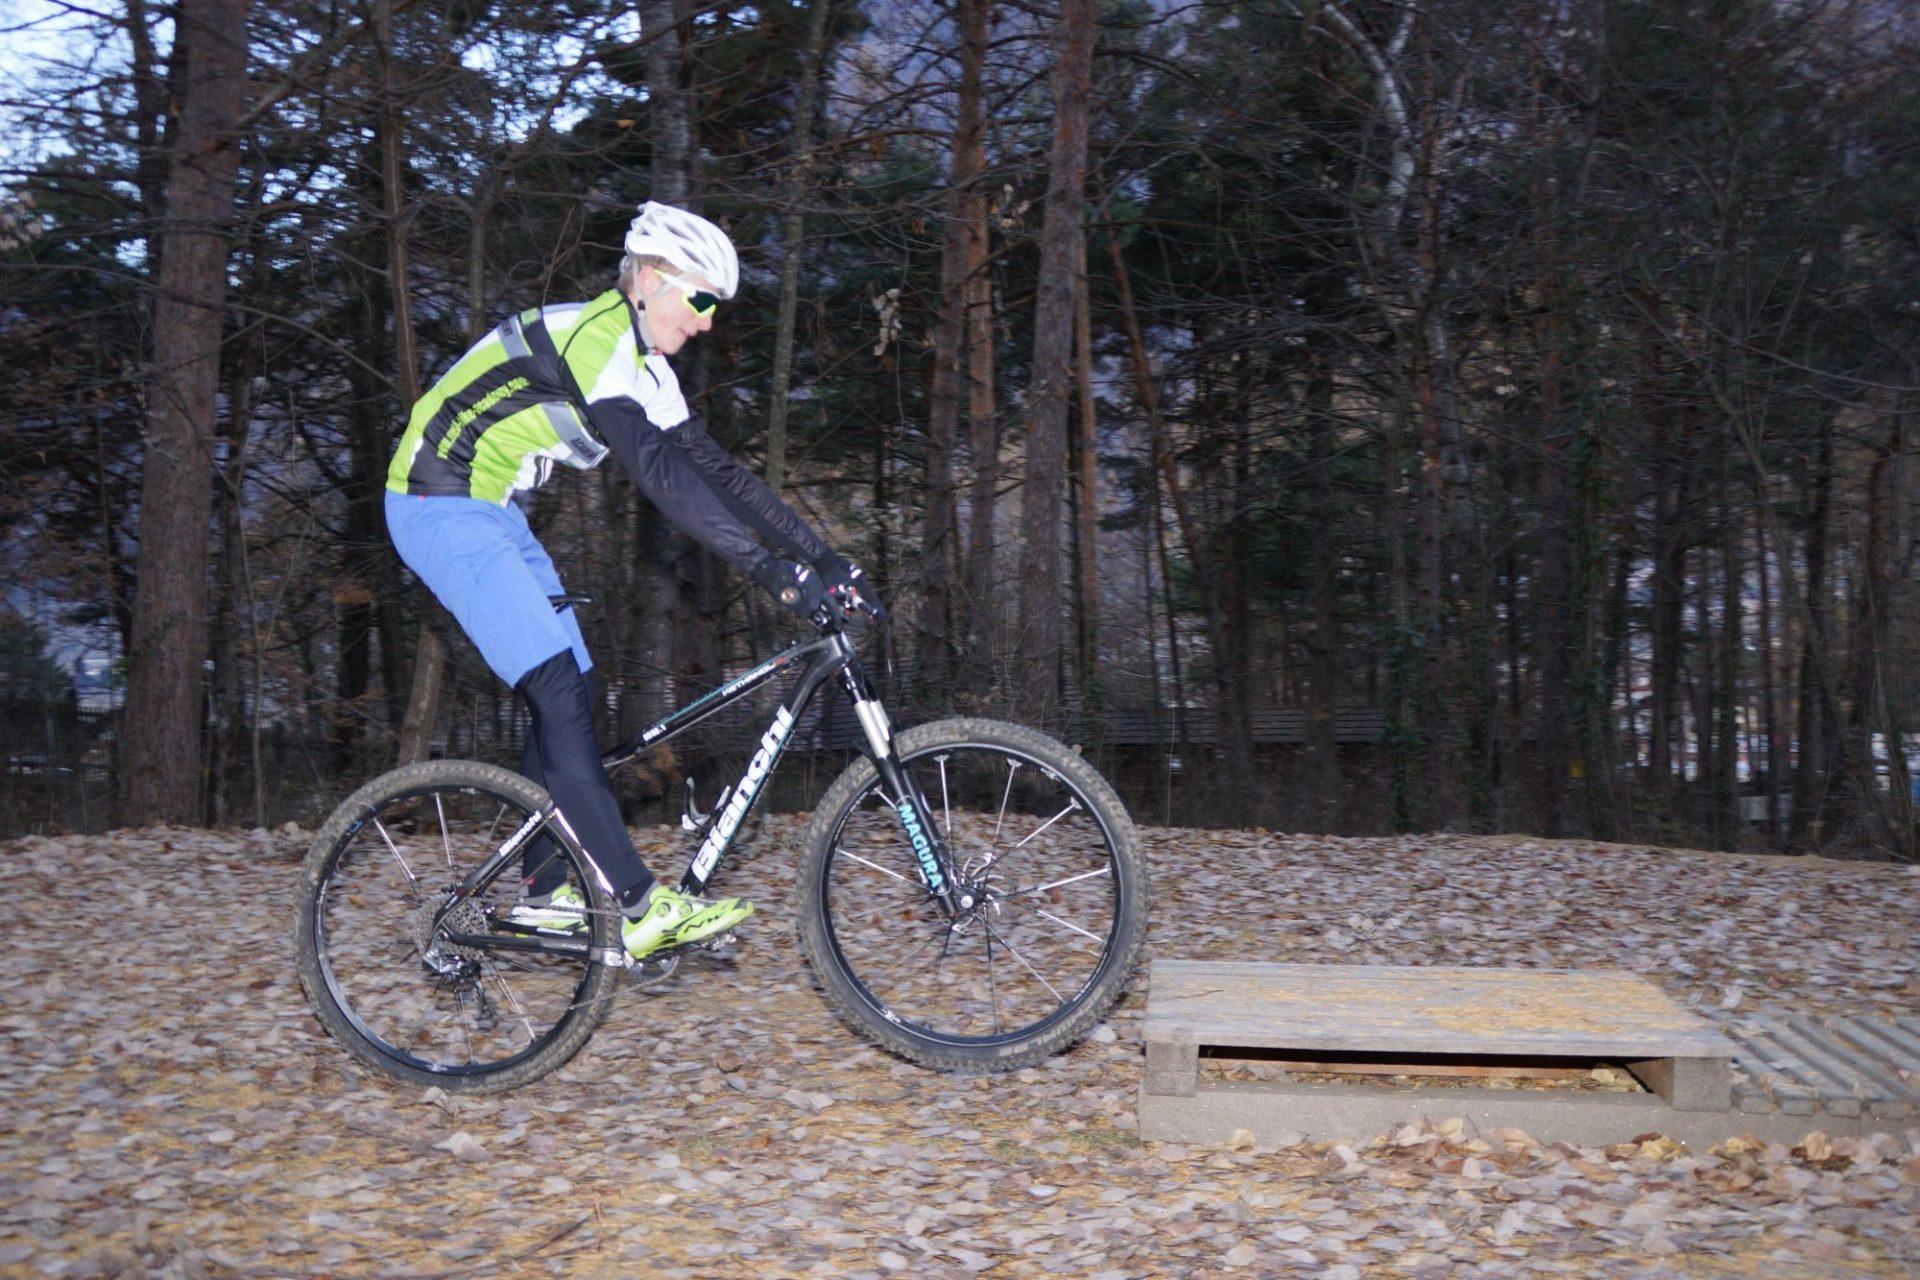 Bergsteigertipp MTB Hindernis 02 I (c) OetziBikeAcqademy